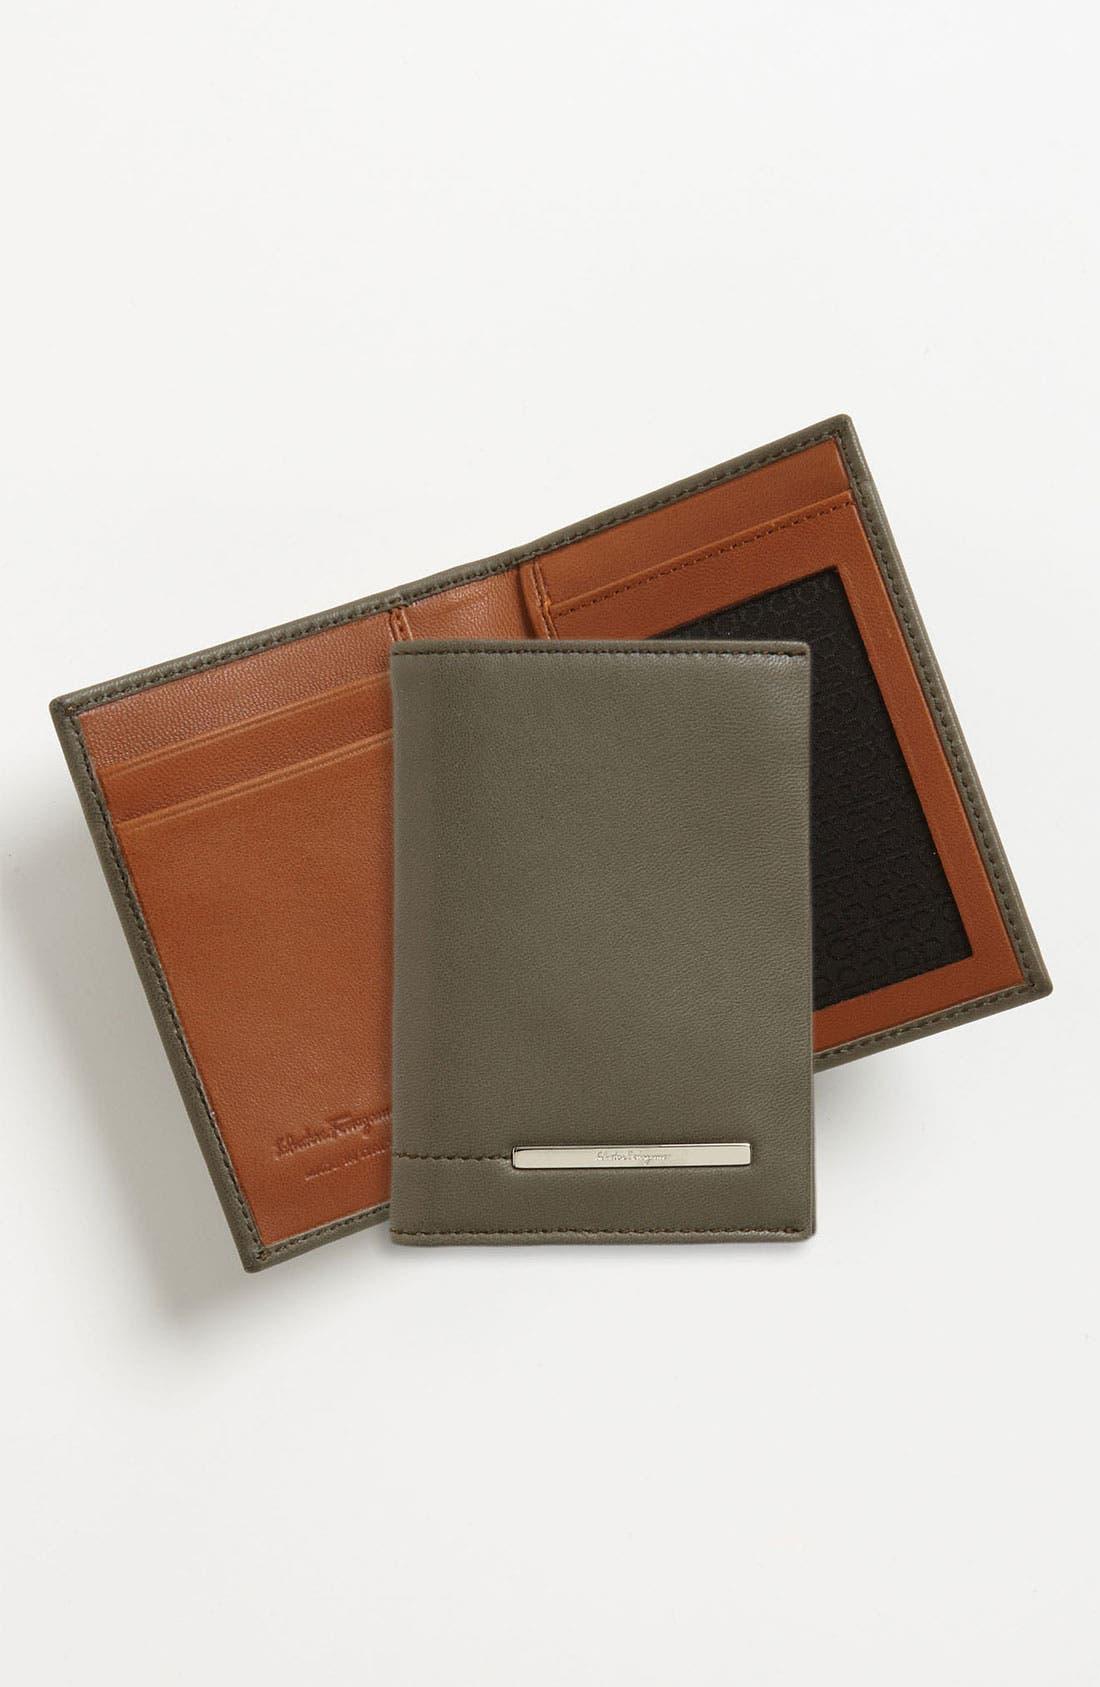 Alternate Image 1 Selected - Salvatore Ferragamo 'Giacomo' Card Case